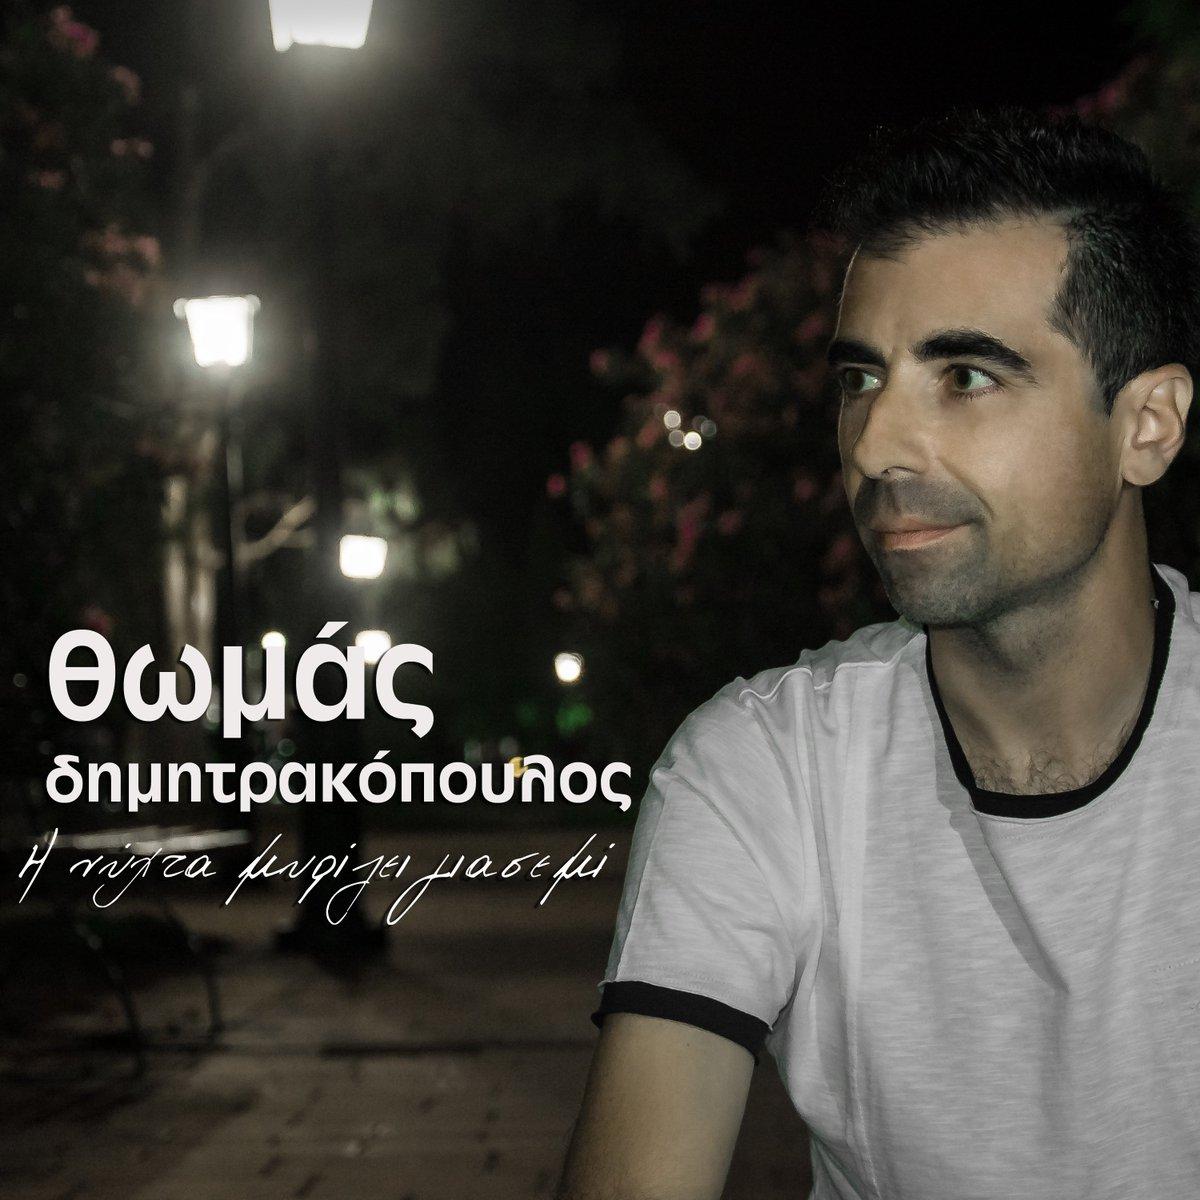 #GiveYoWinterSeason❄️❄️ #ADifferentMusicFeel #Wit >> #ThomasDimitrakopoulos  @thomasdimitrako #LatestProject>>#Θωμάς Δημητρακόπουλος - Μα Πώς Μπορεί.. #HowYouCan #AvailableNow: #YouTube>  ##FollowHimToday!!!